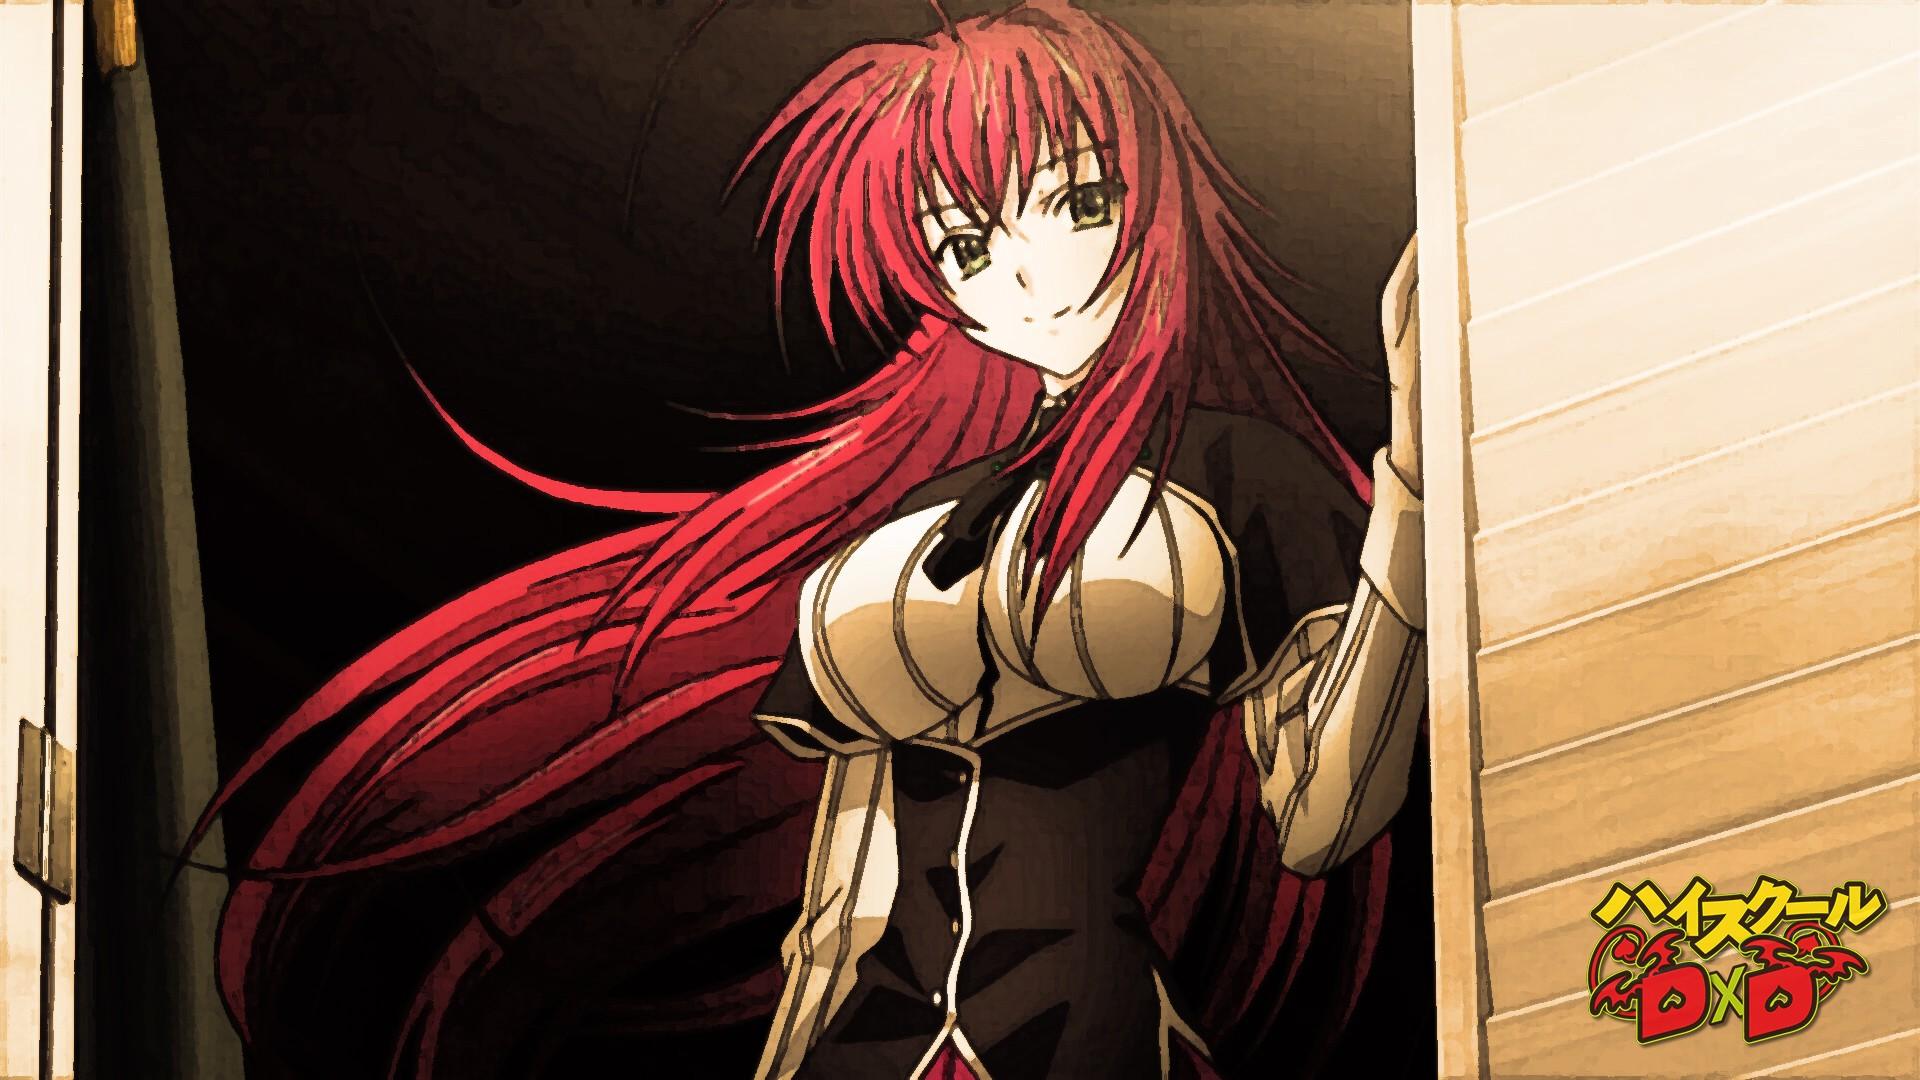 illustration anime red Gremory Rias comics High School DxD mangaka